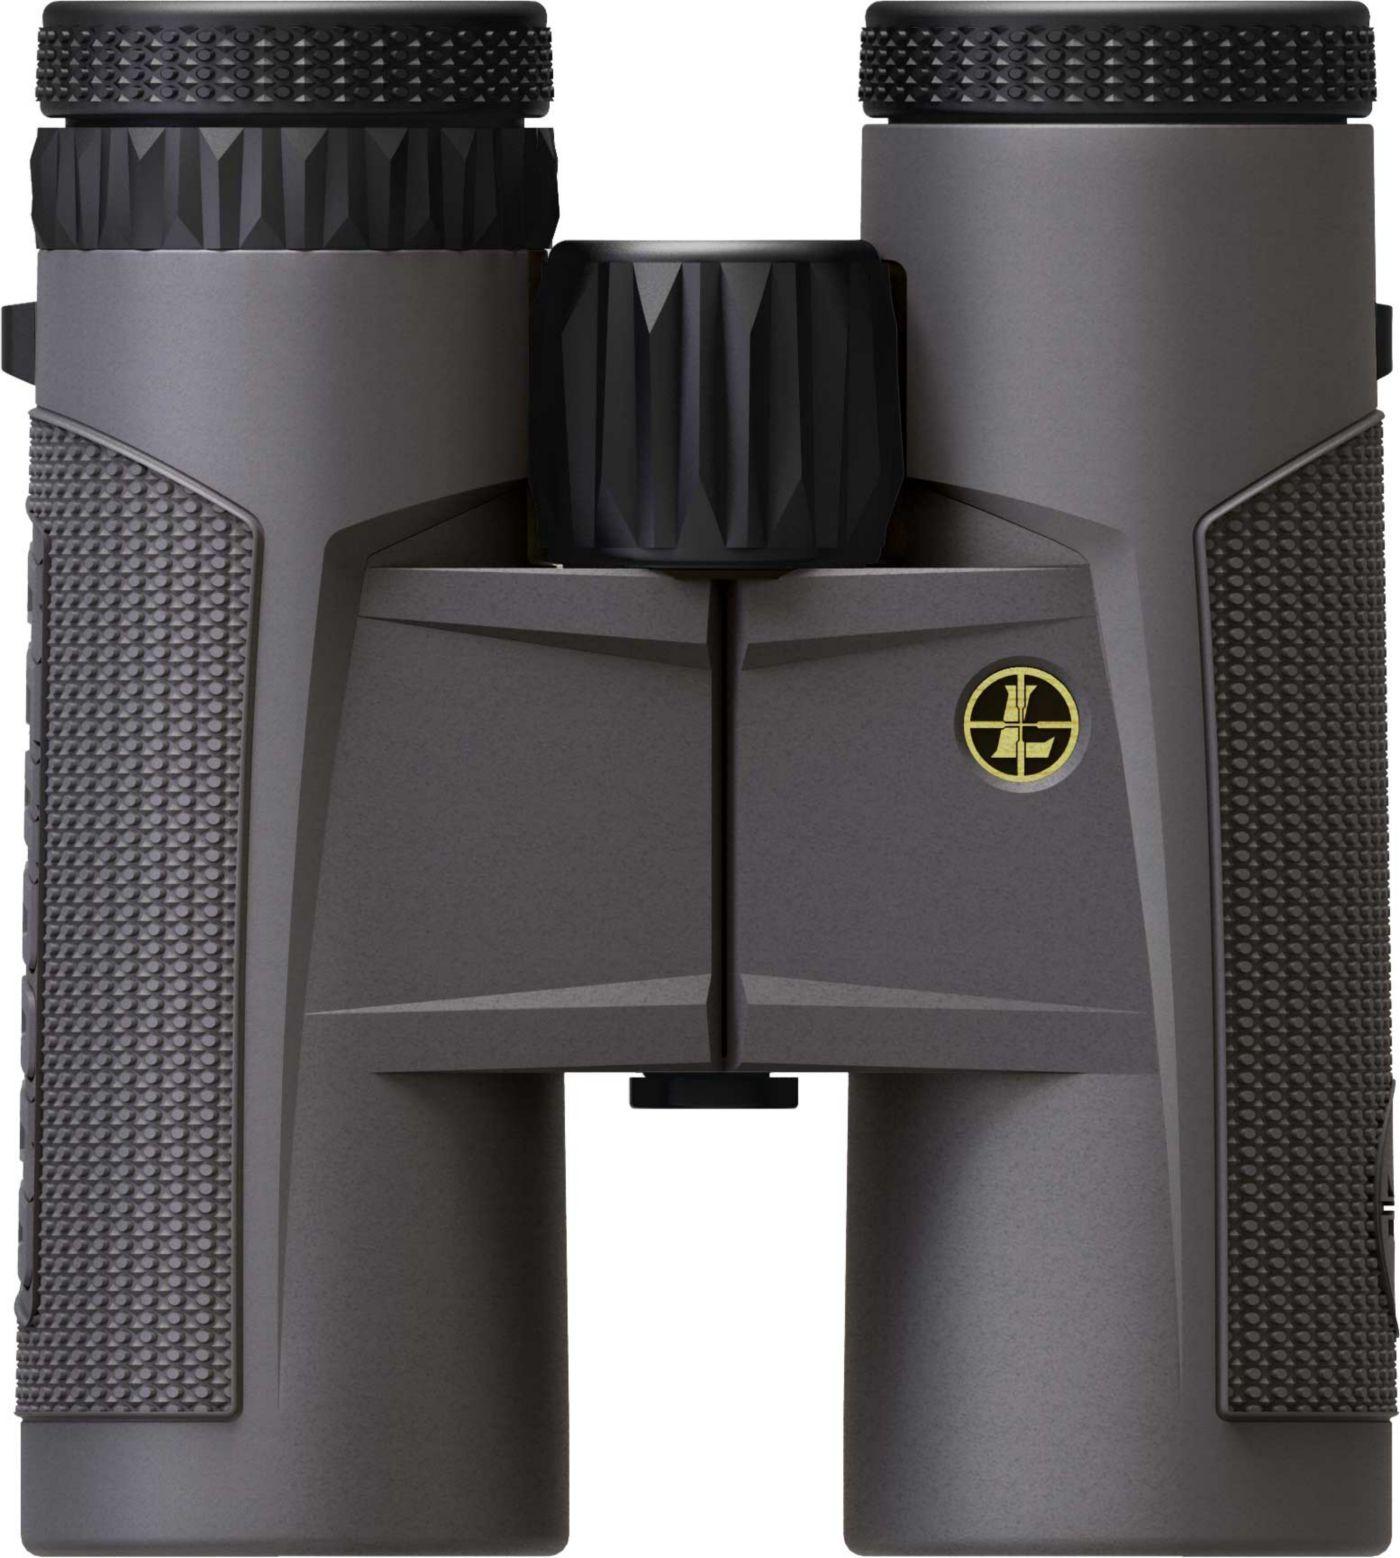 Leupold BX-2 Tioga HD 8x42mm Binoculars